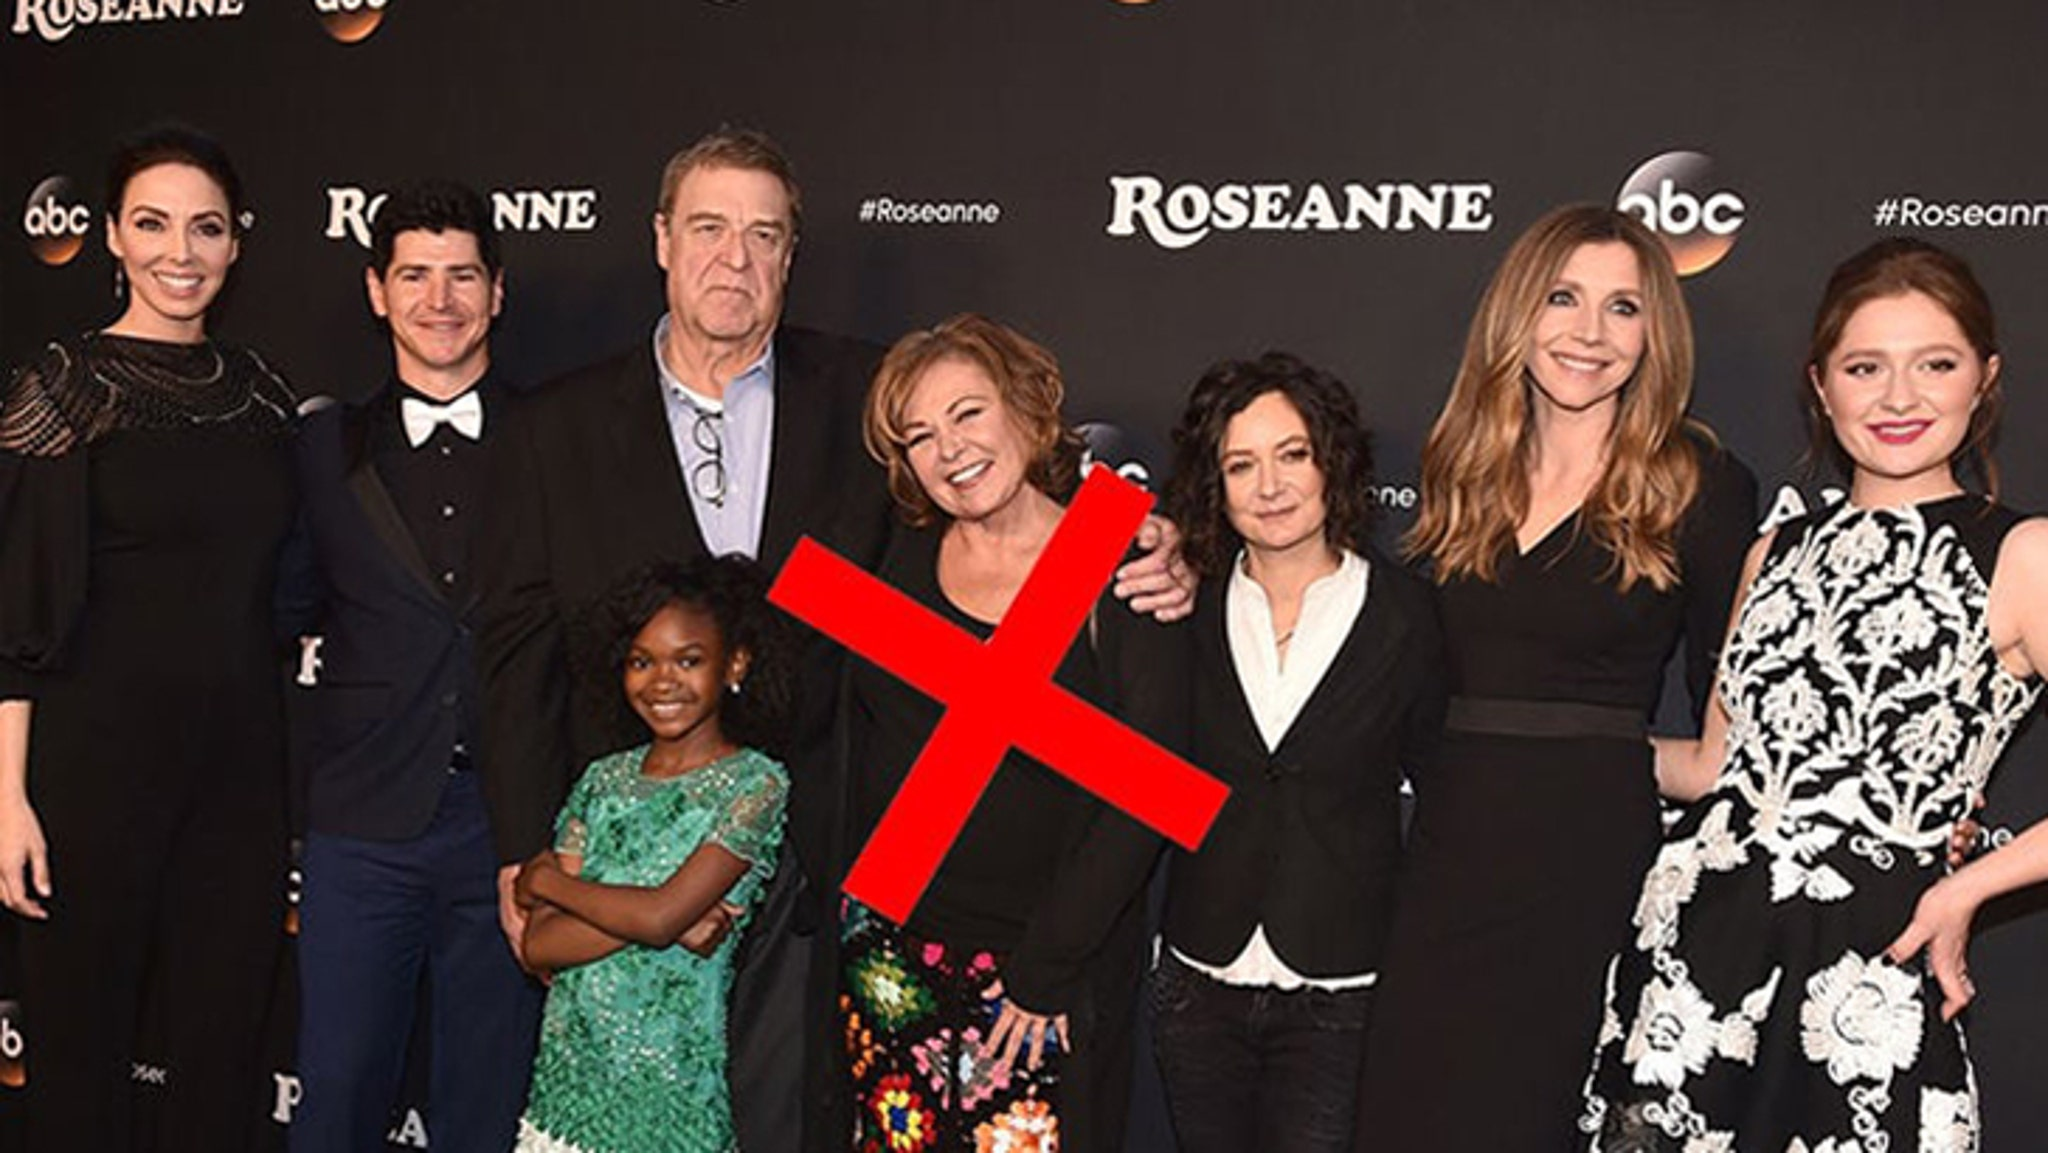 Roseanne Bs